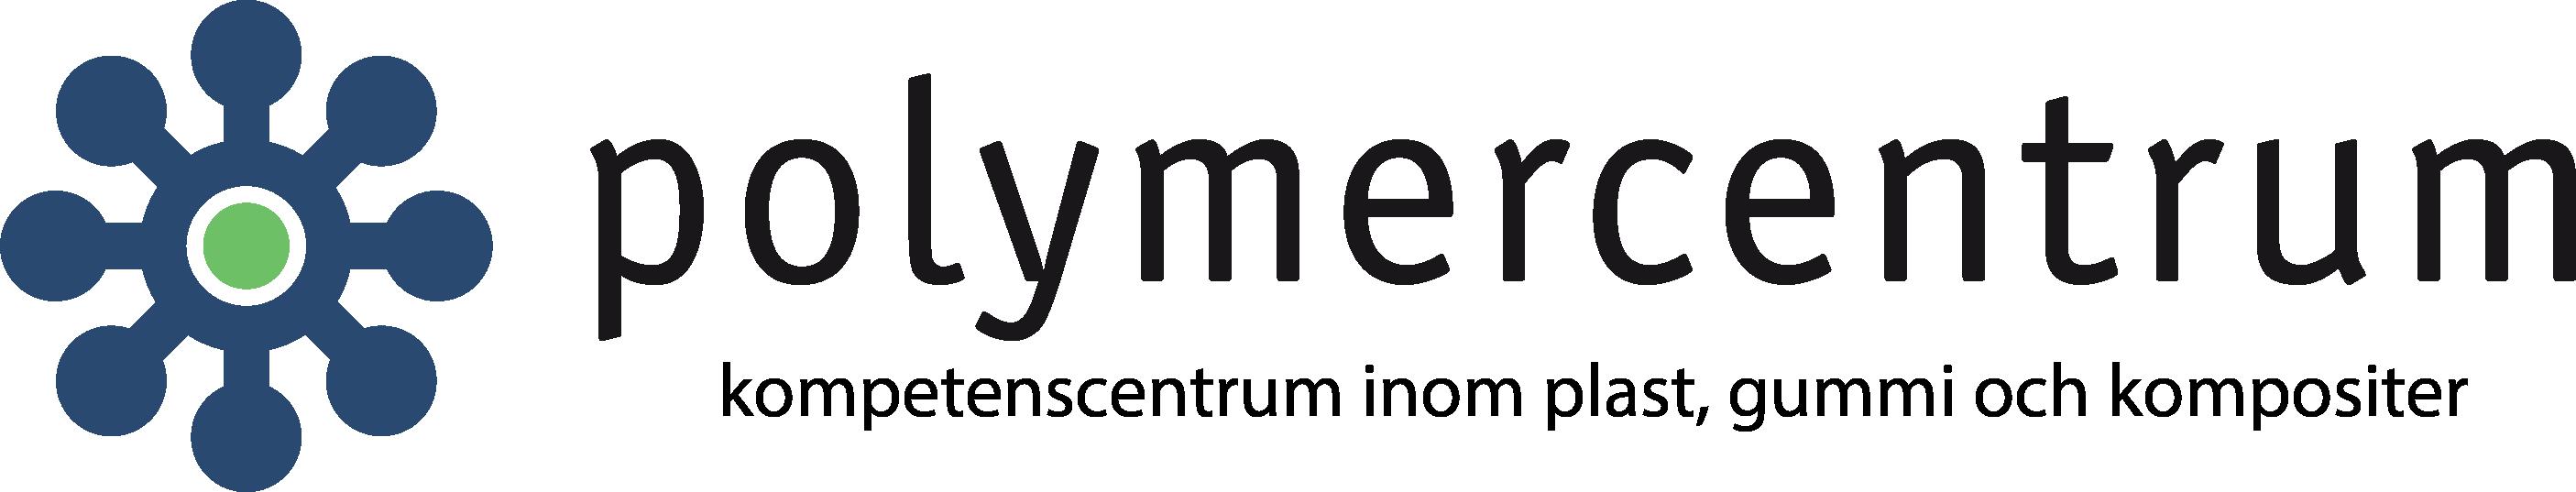 Polymercentrum